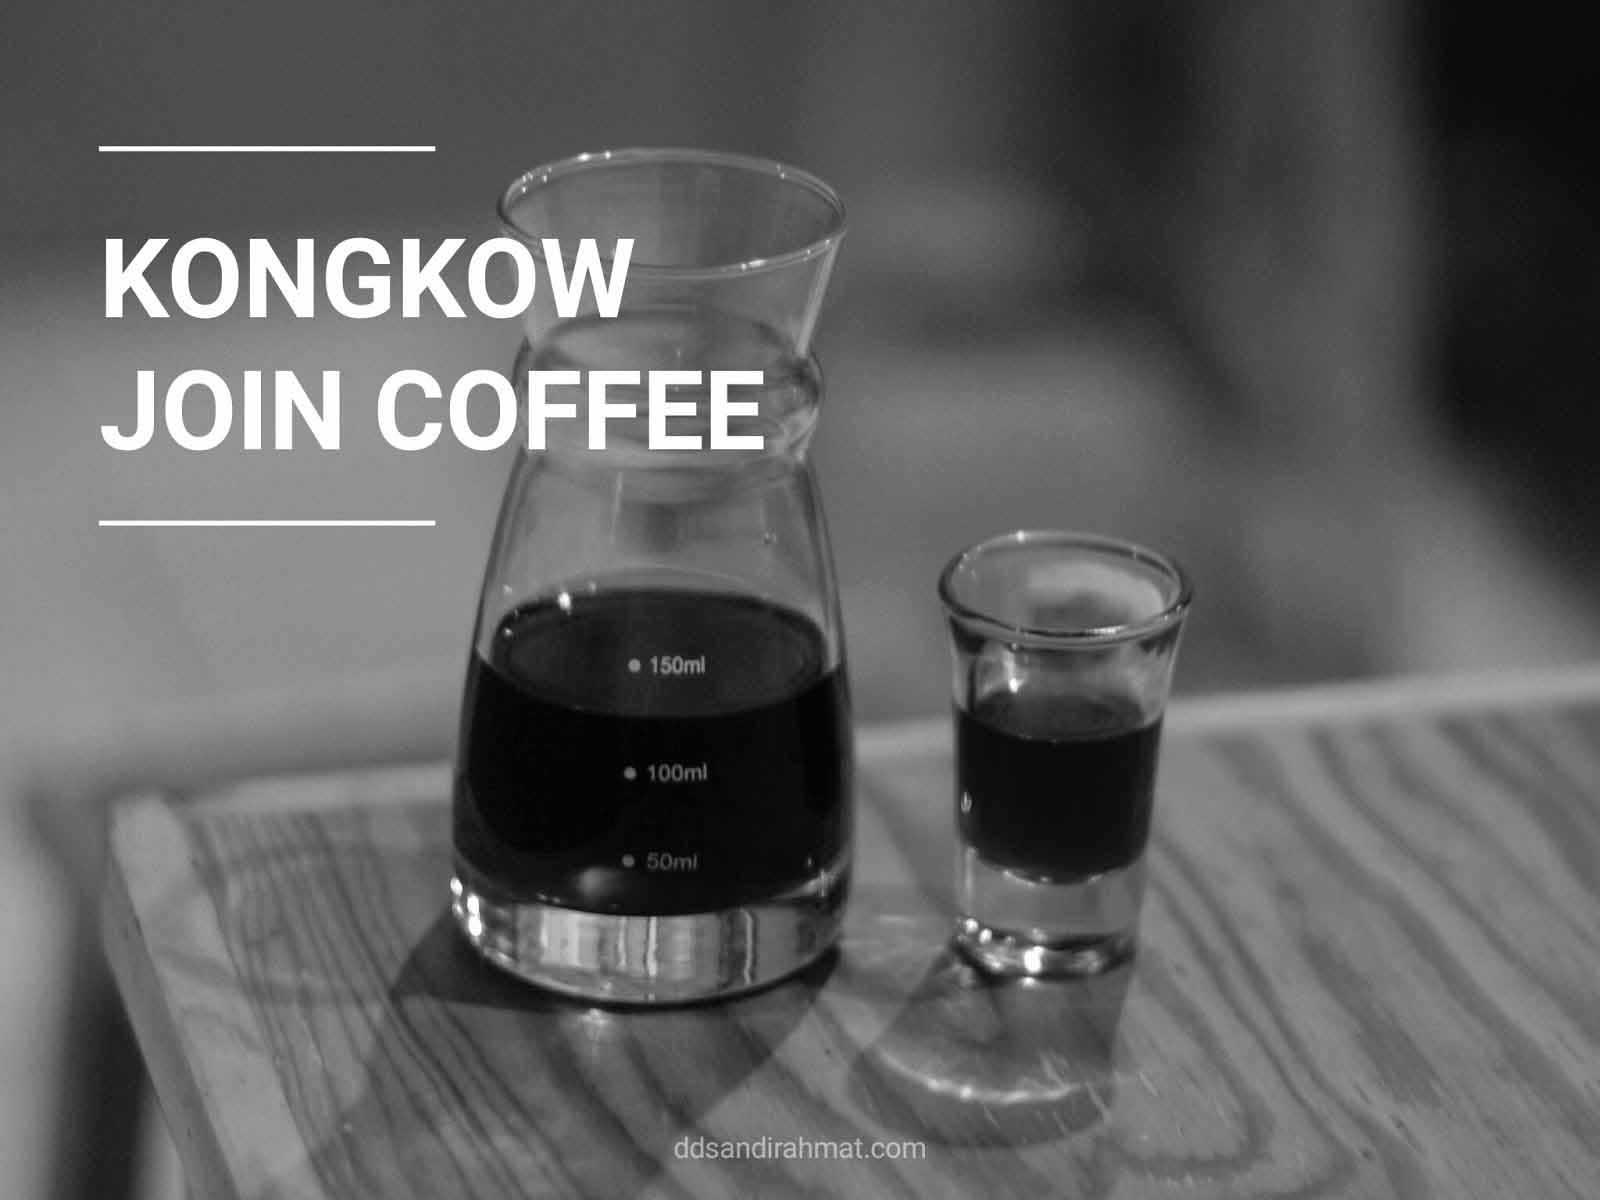 Kongkow Join Coffee